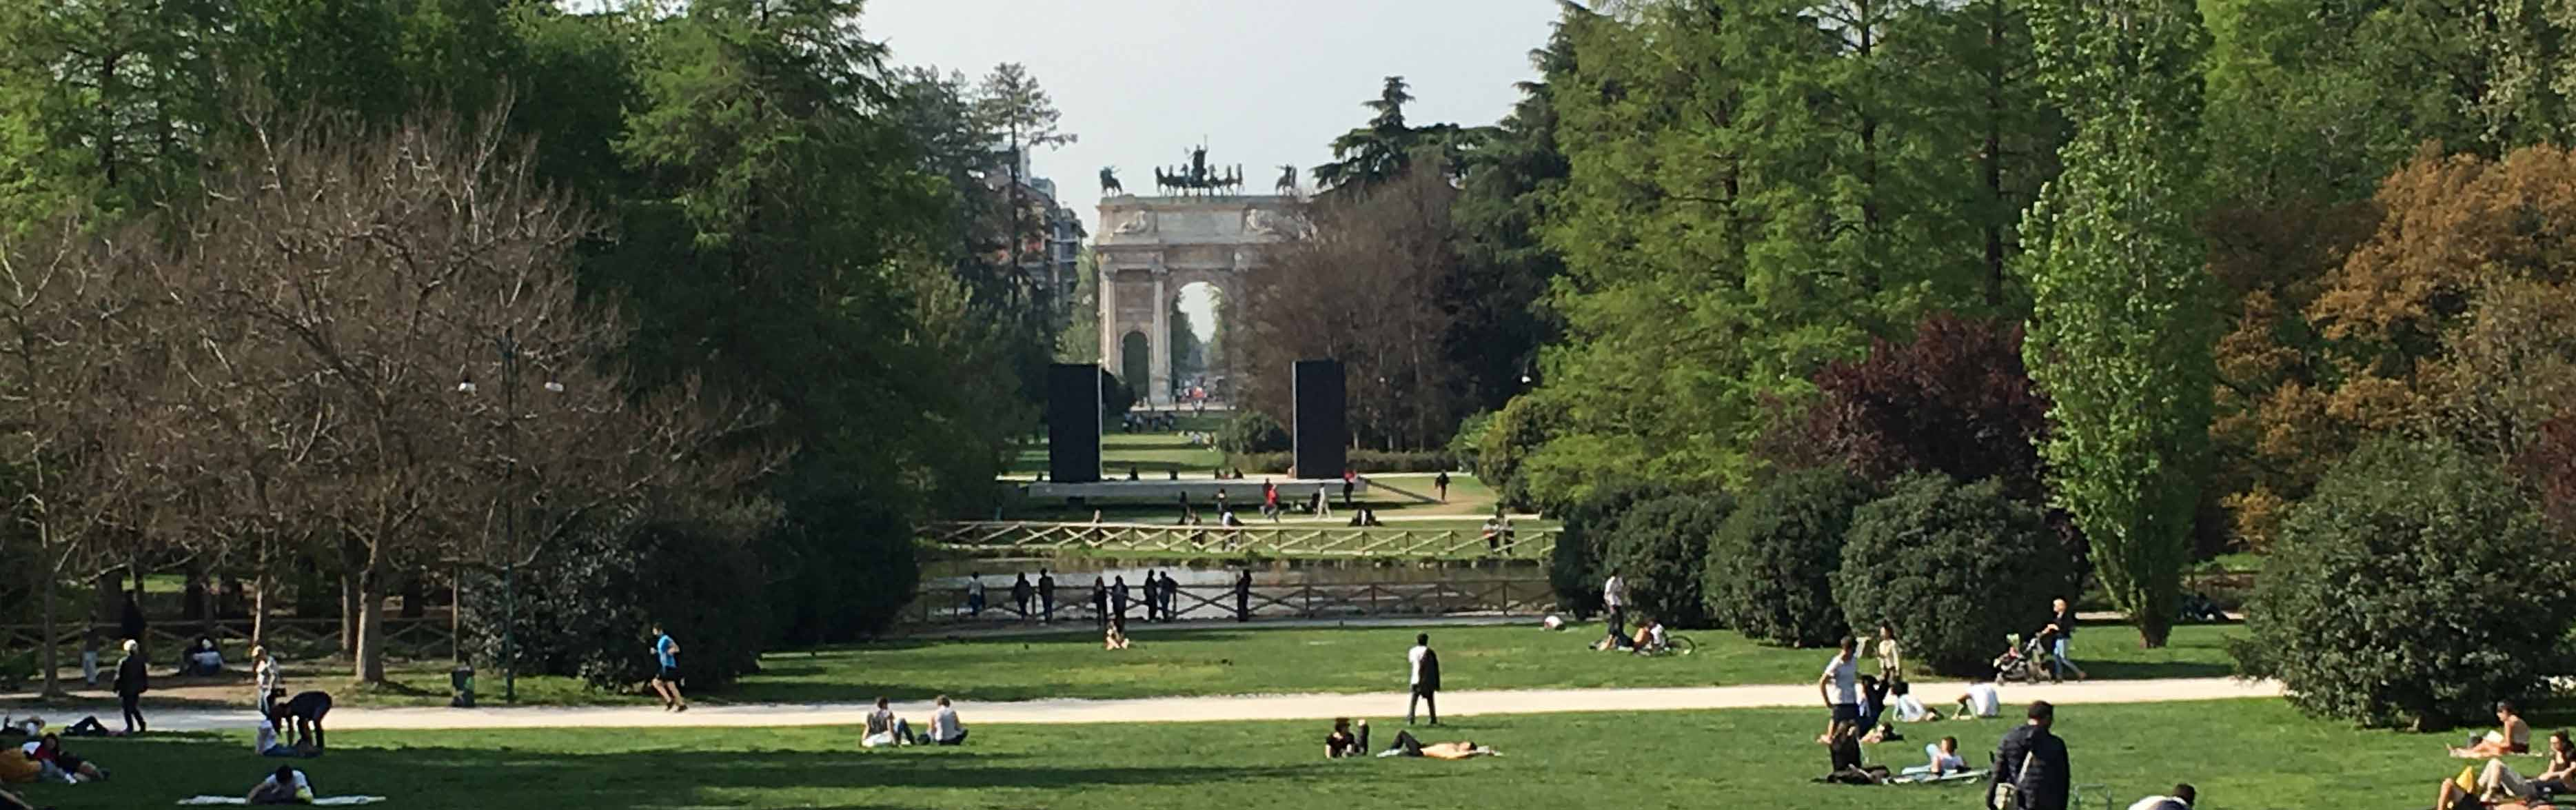 Parco Sempione, Milano